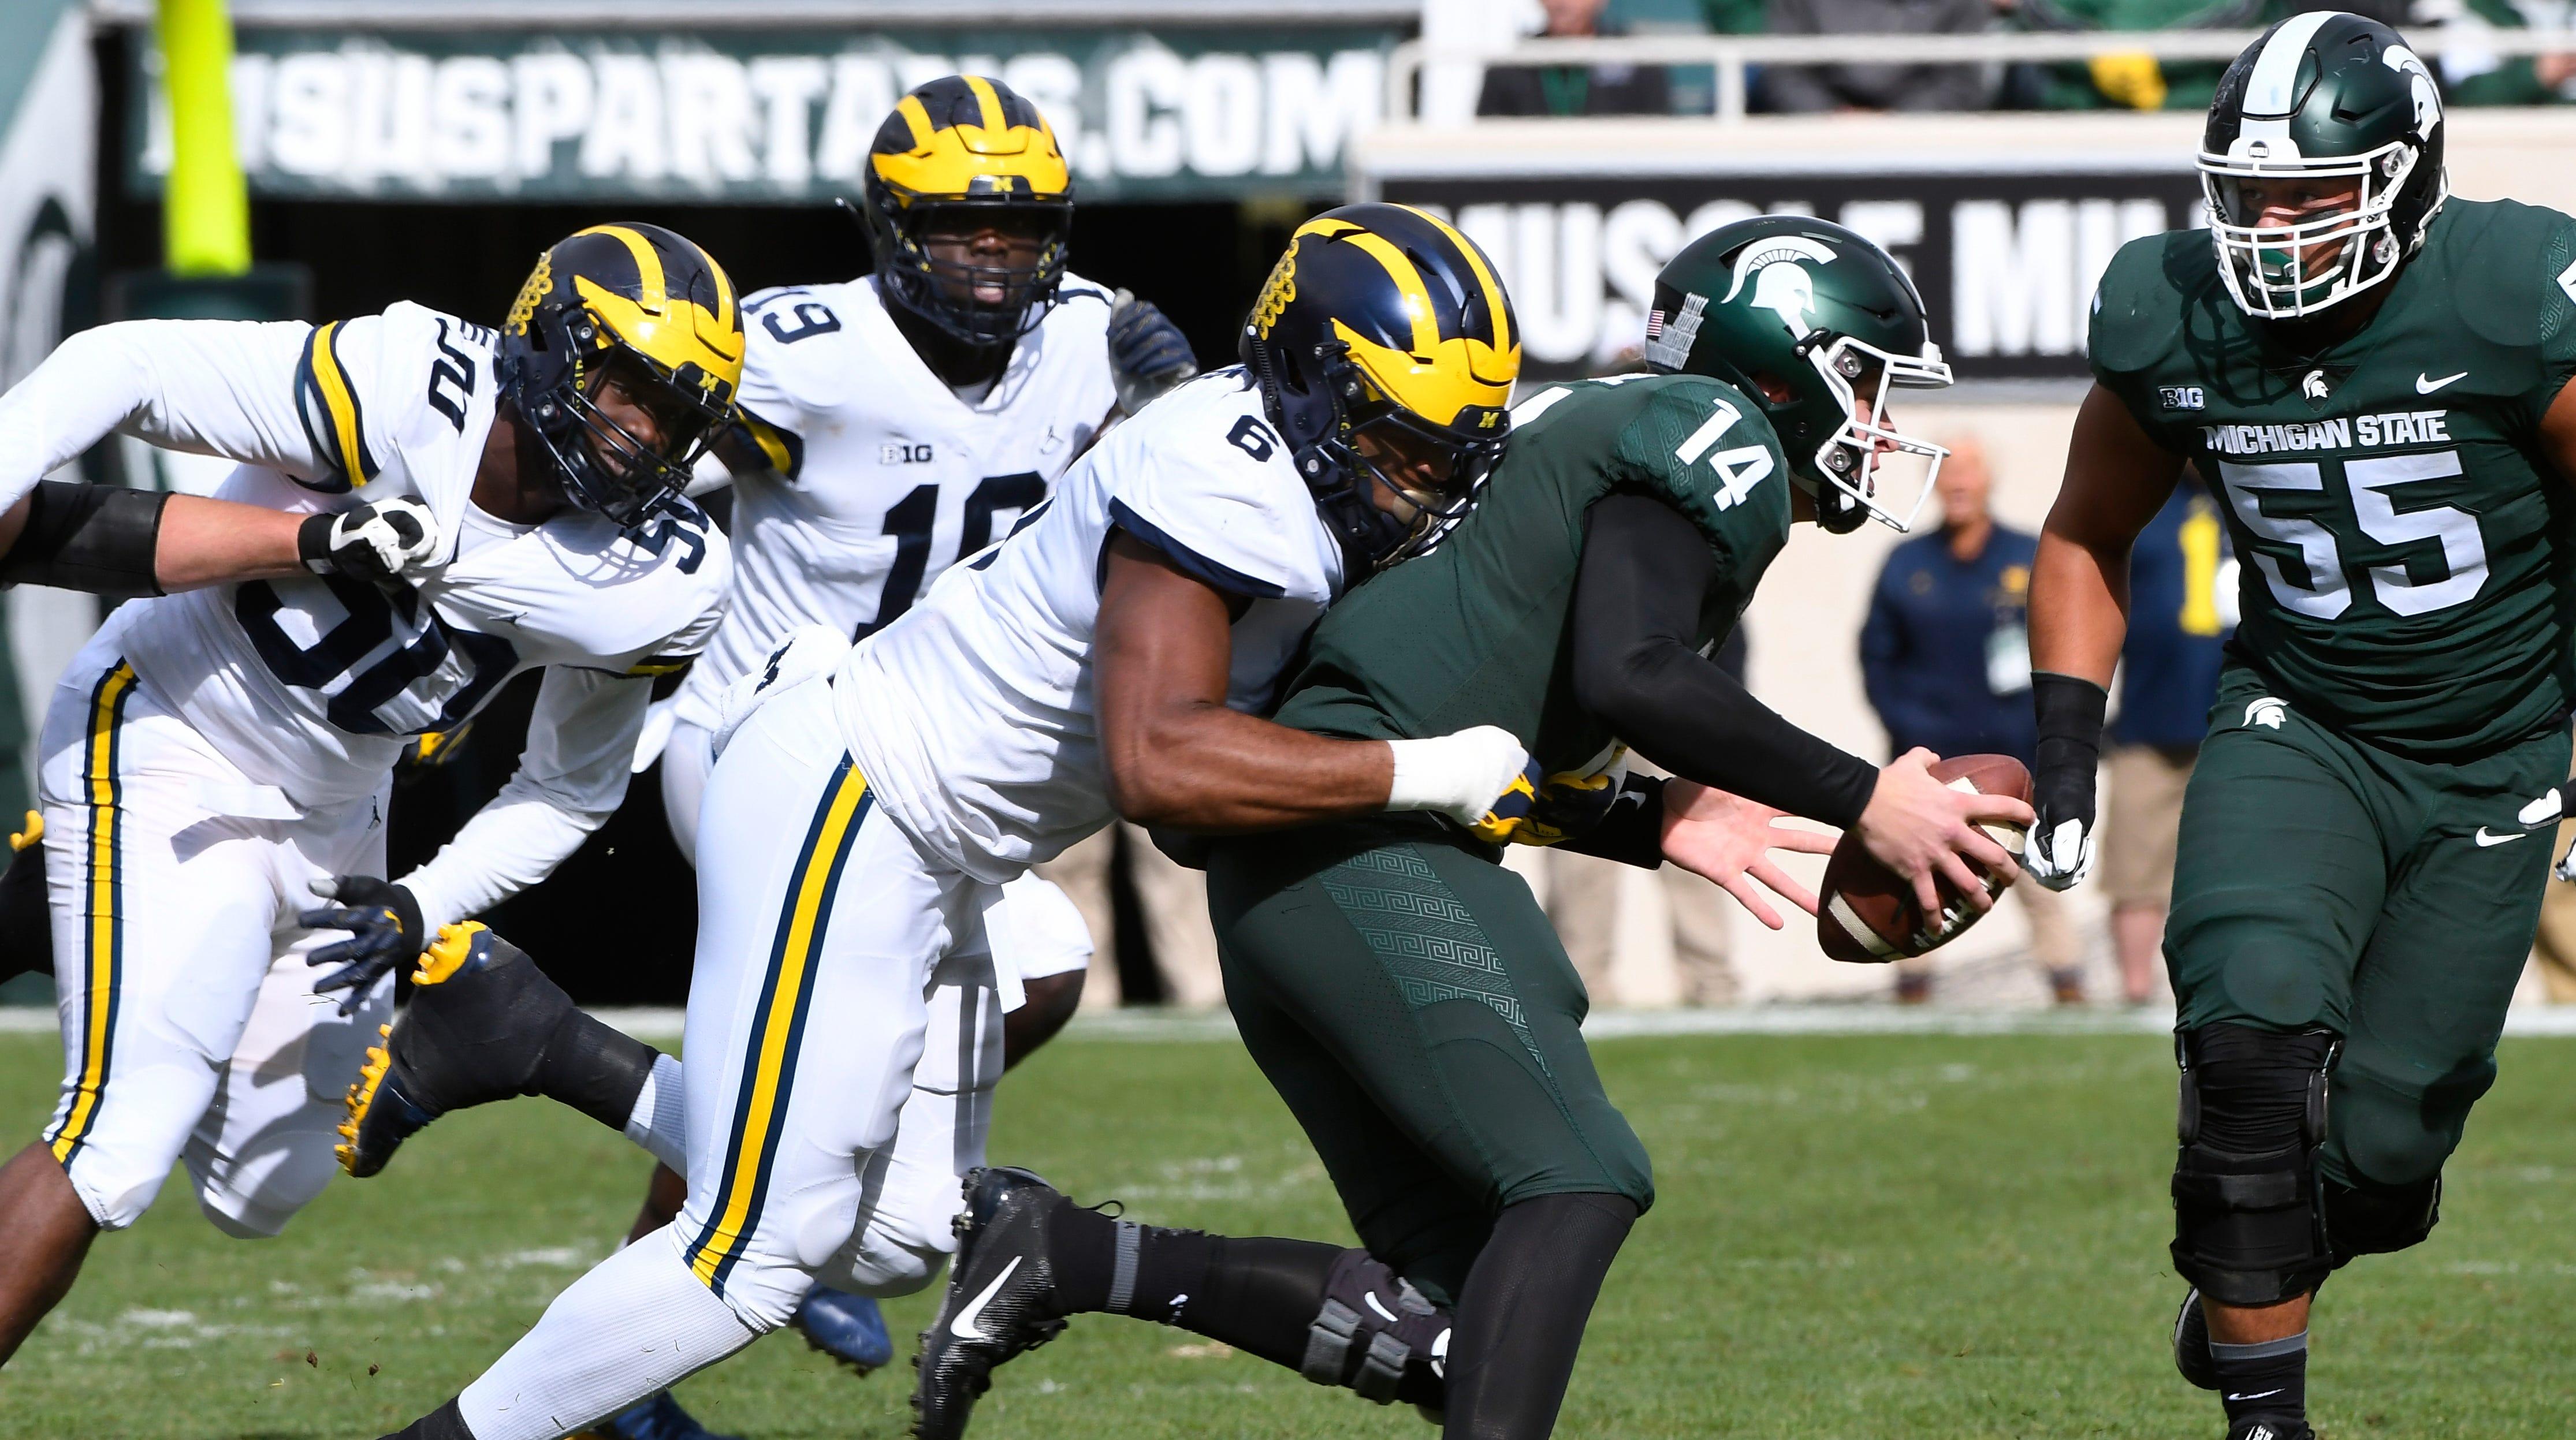 Michigan's Josh Uche (6) sacks Michigan State quarterback Brian Lewerke in the first quarter.